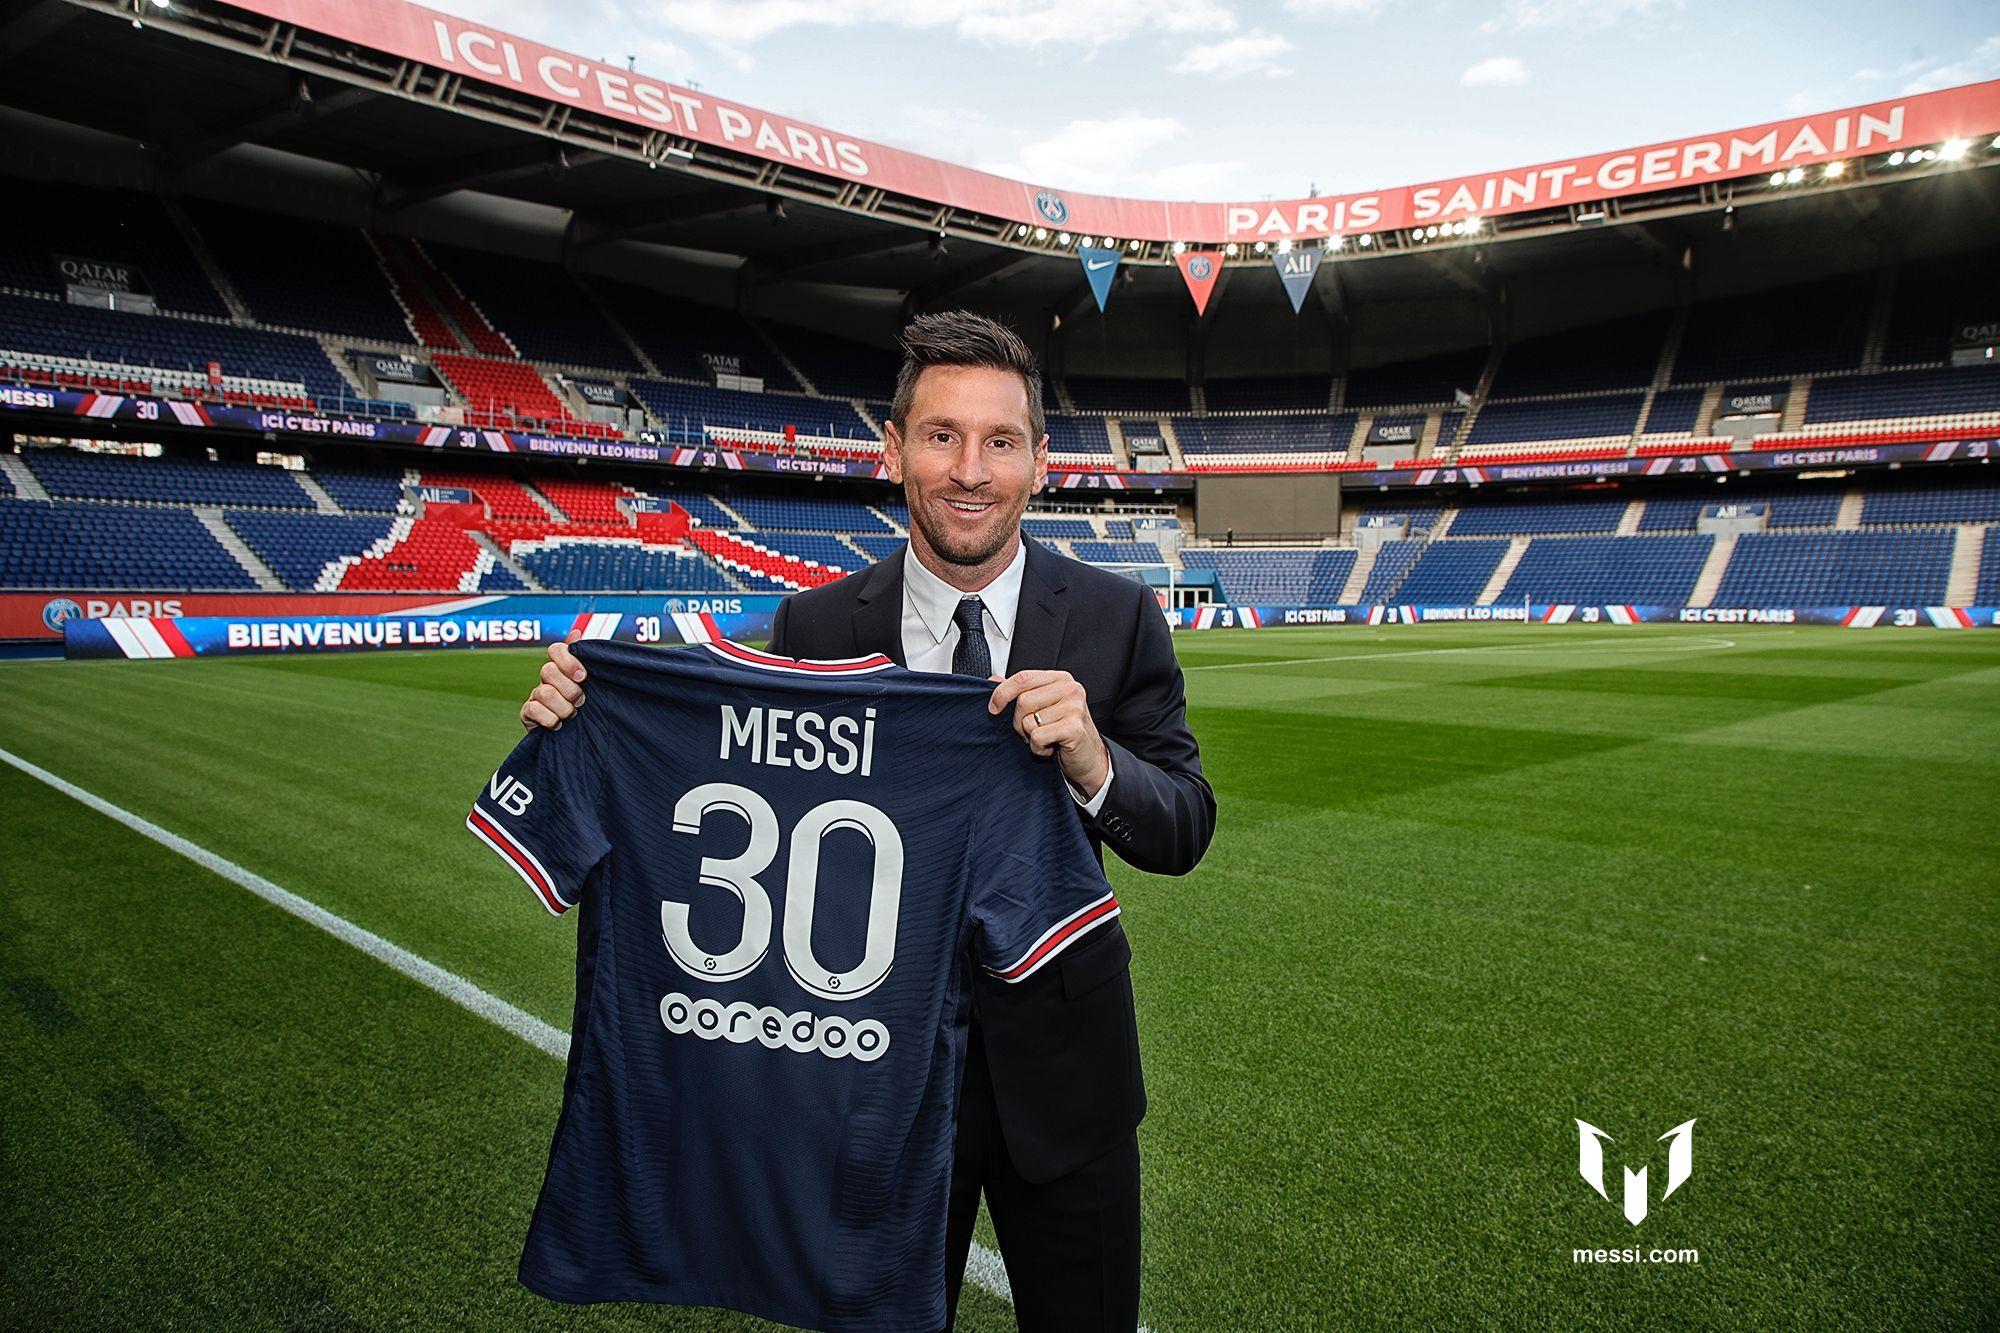 Messi tham gia Paris Saint-Germain